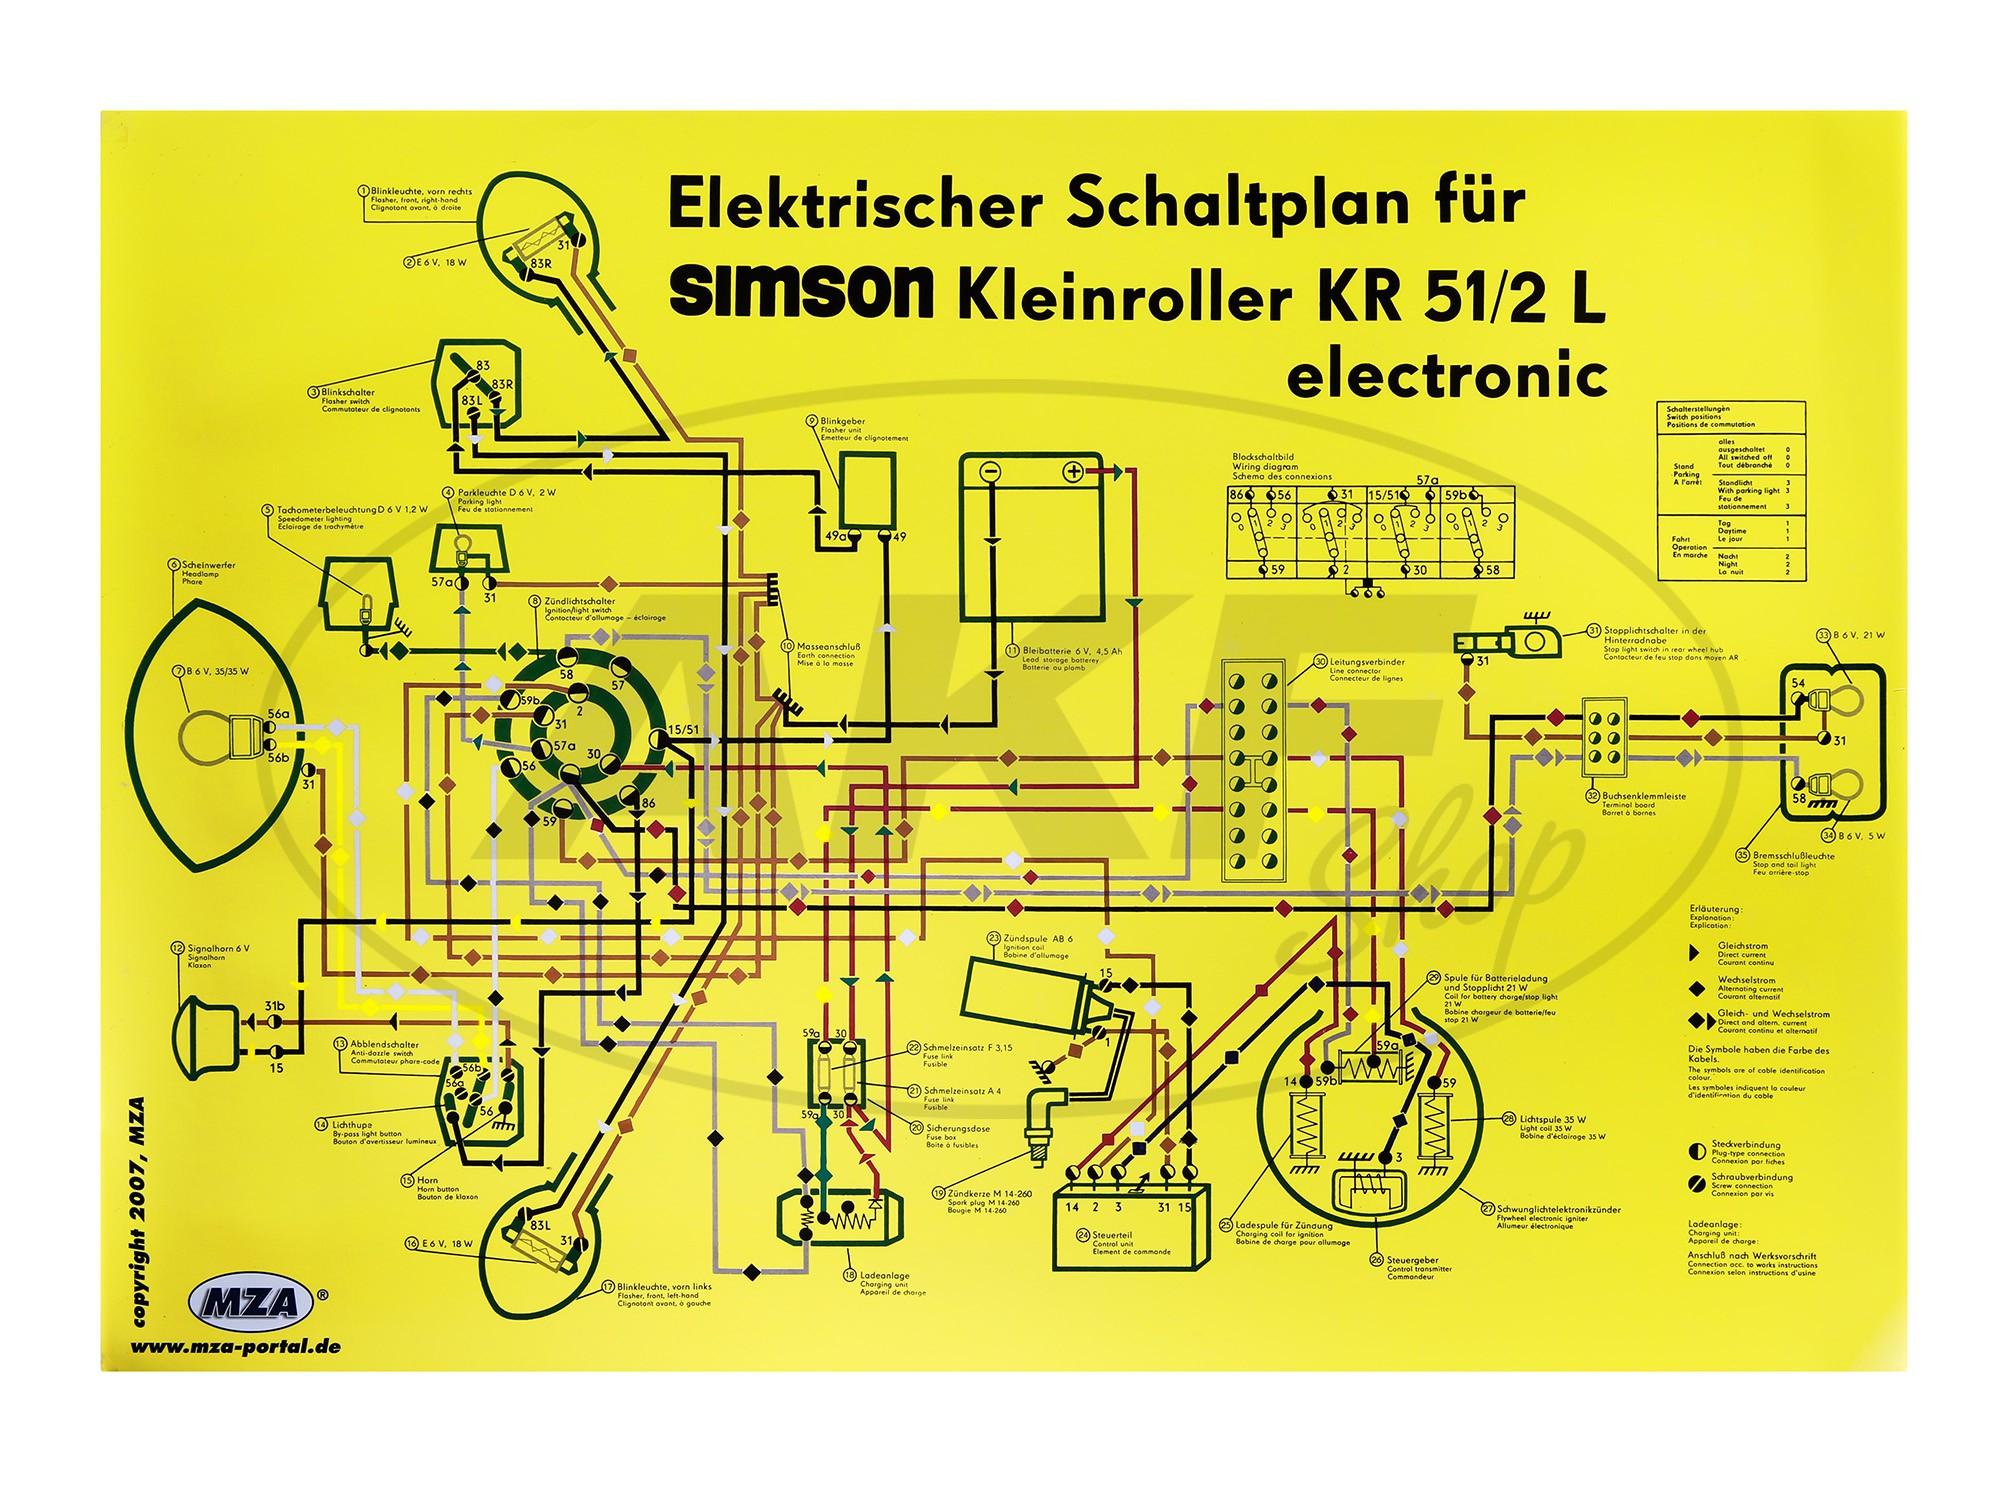 Schaltplan Farbposter (69x49cm) Schwalbe KR51/2L electronic ...